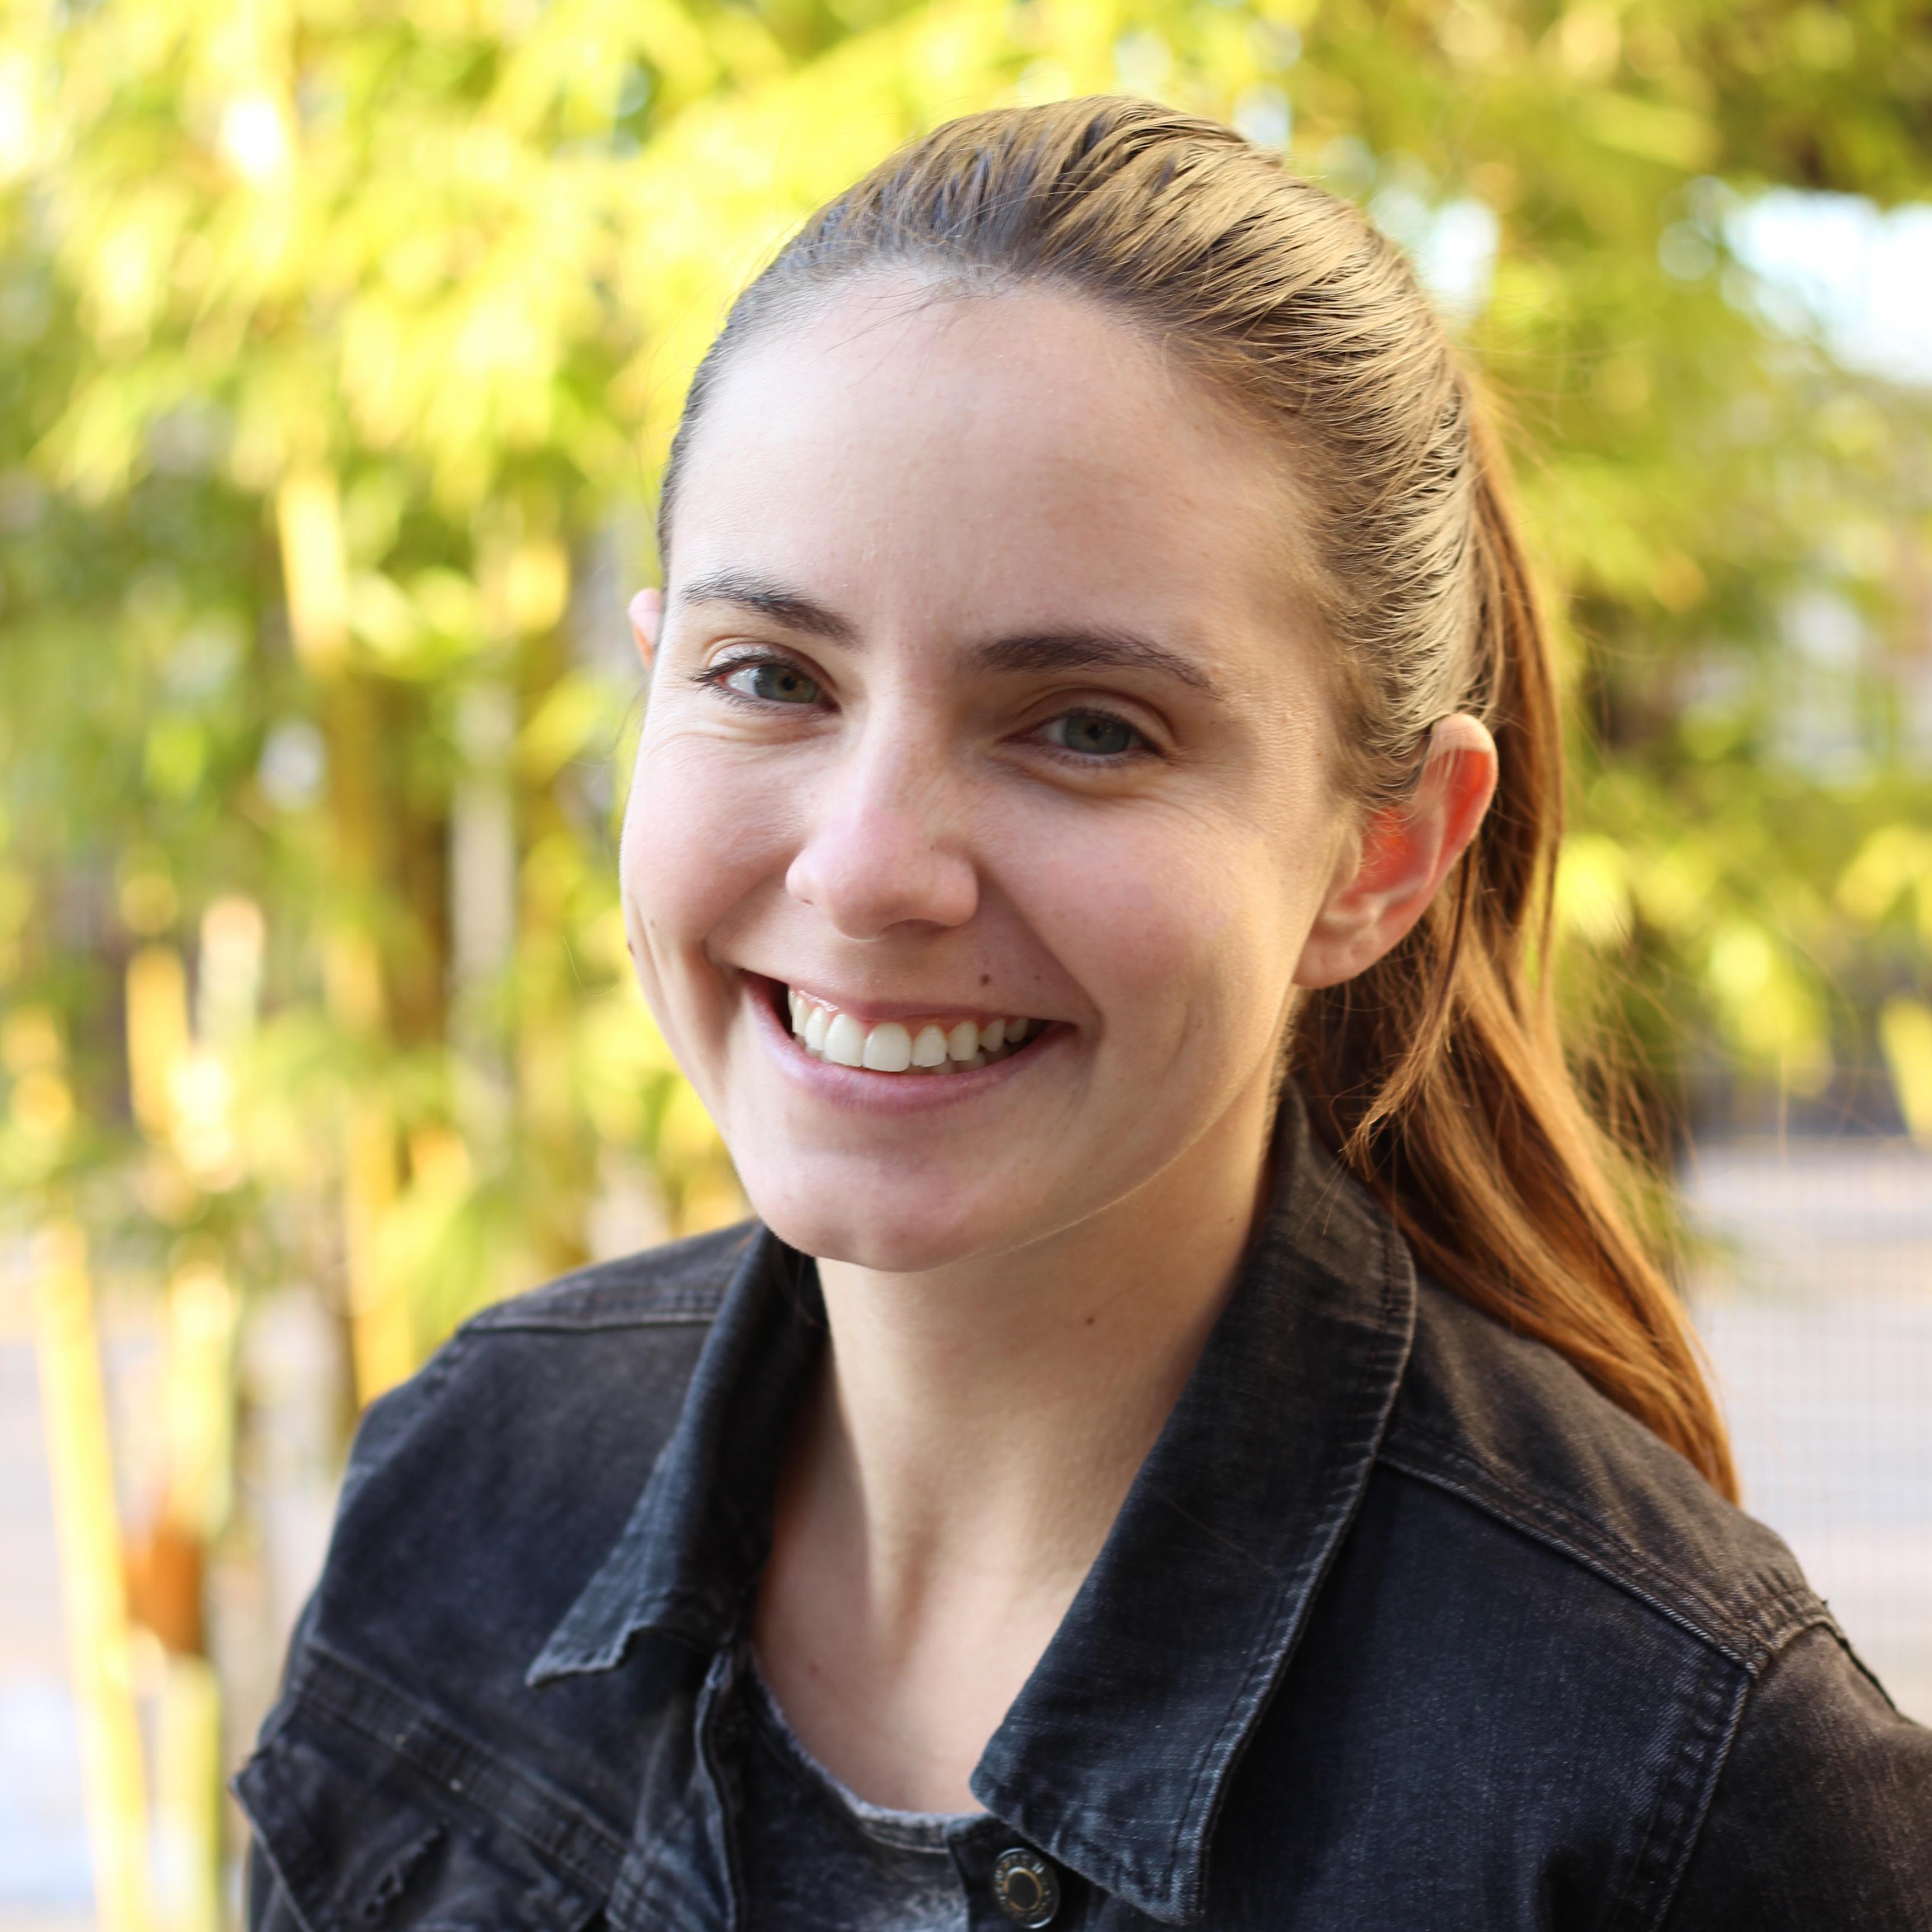 Kaitlin Wichmann